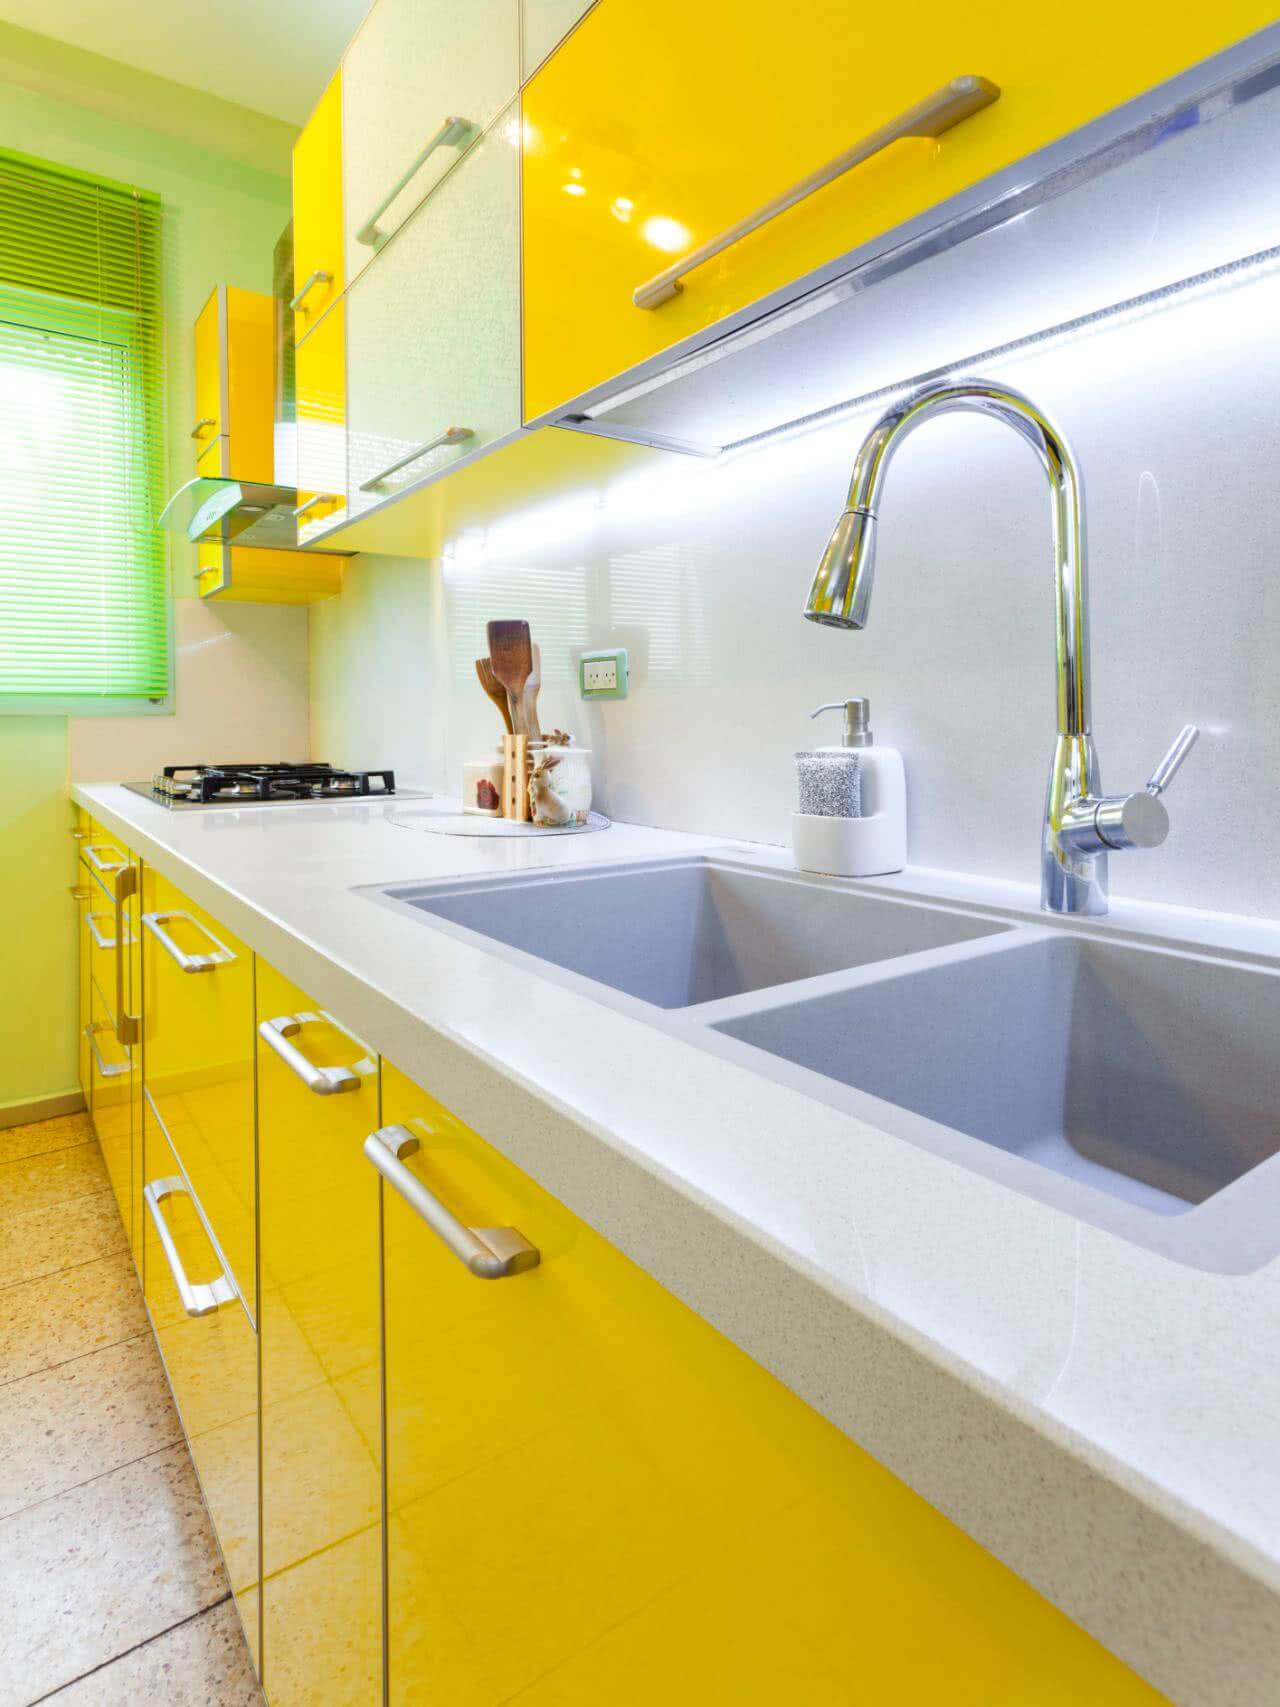 Granito branco na cozinha amarela